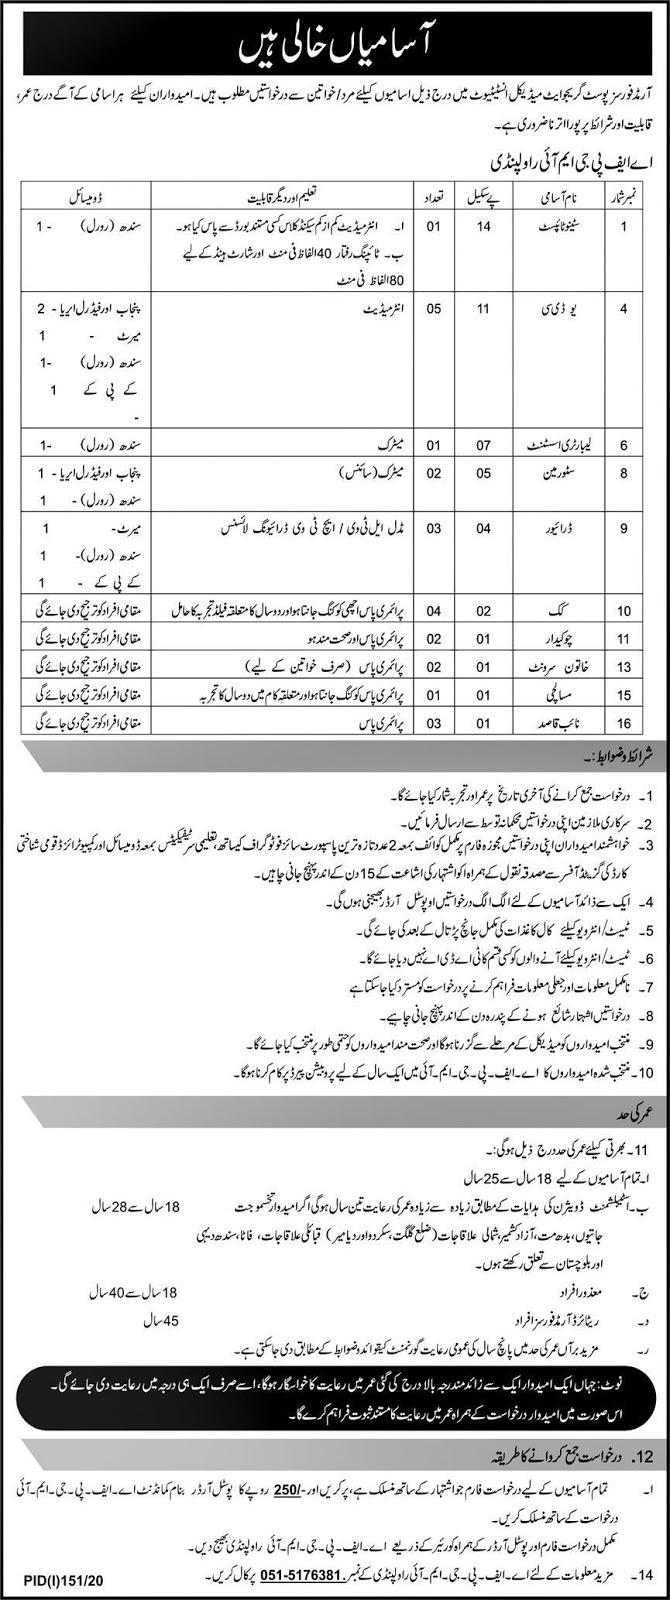 Armed Forces Post Graduate Medical Institute Rawalpindi Jobs